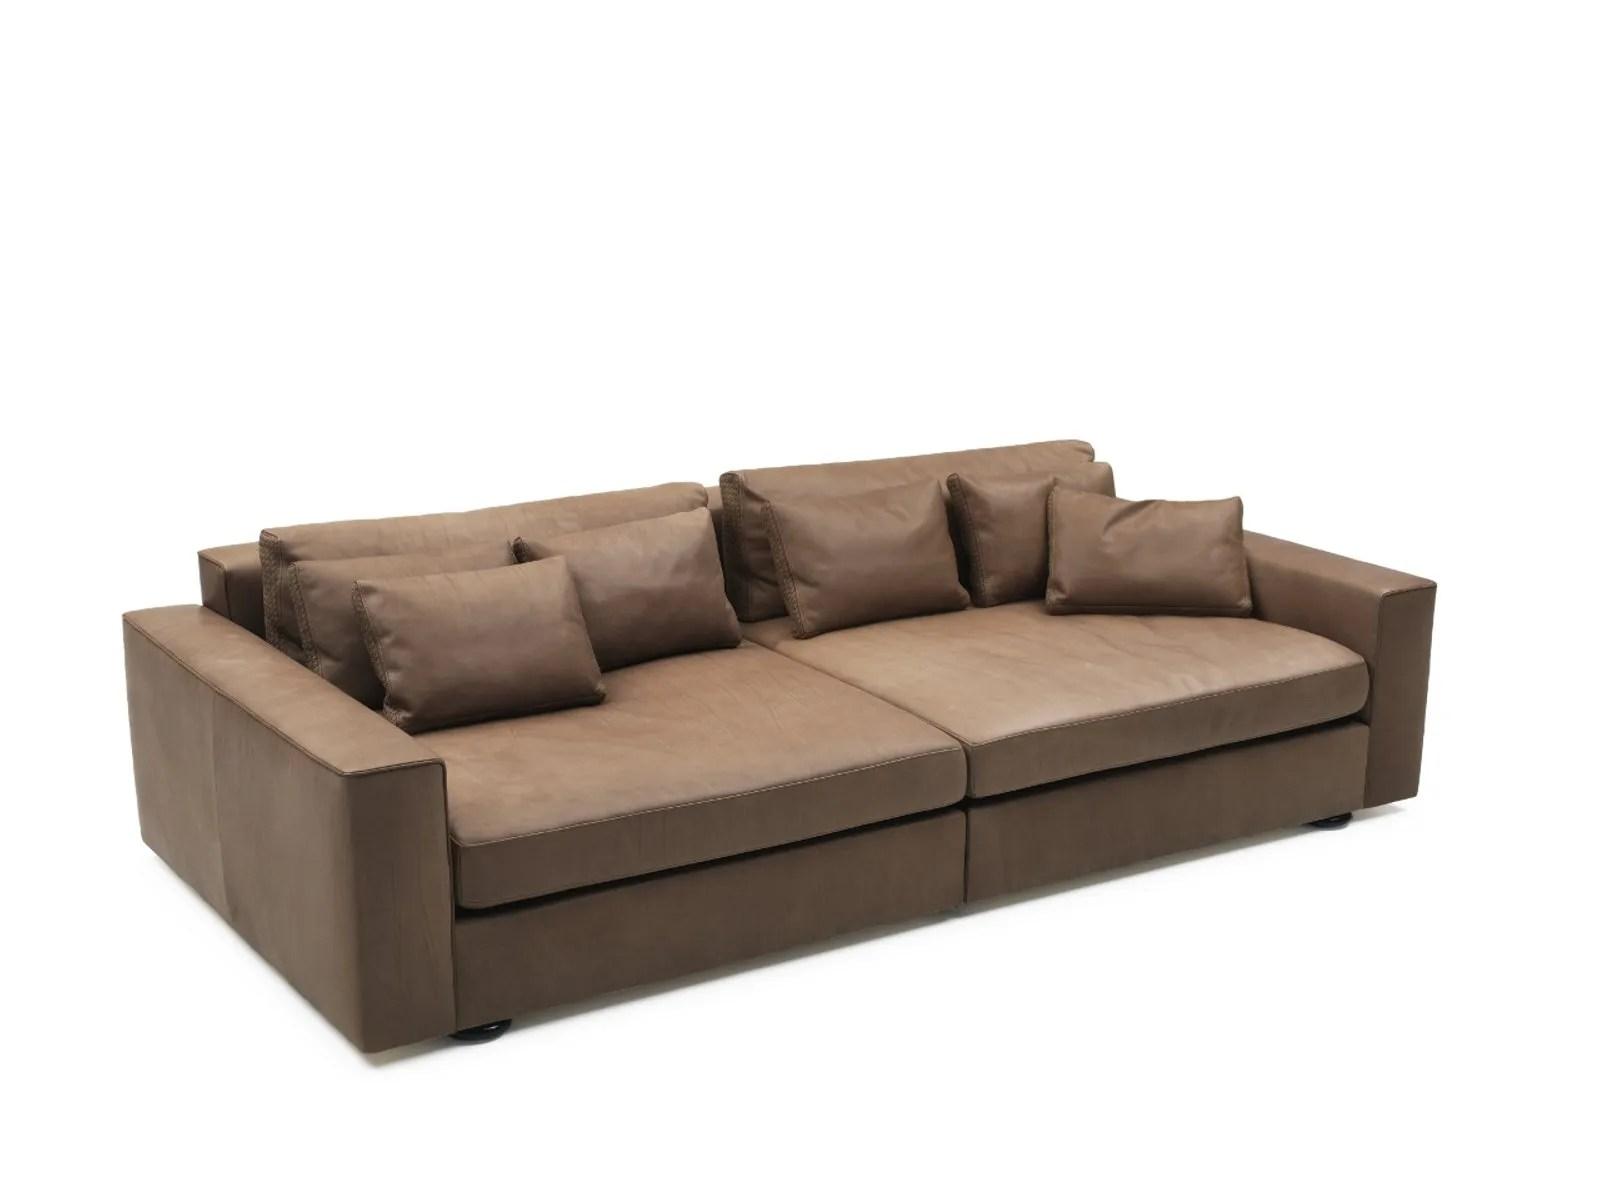 de sede sleeper sofa comfiest ds 247 by design gordon guillaumier